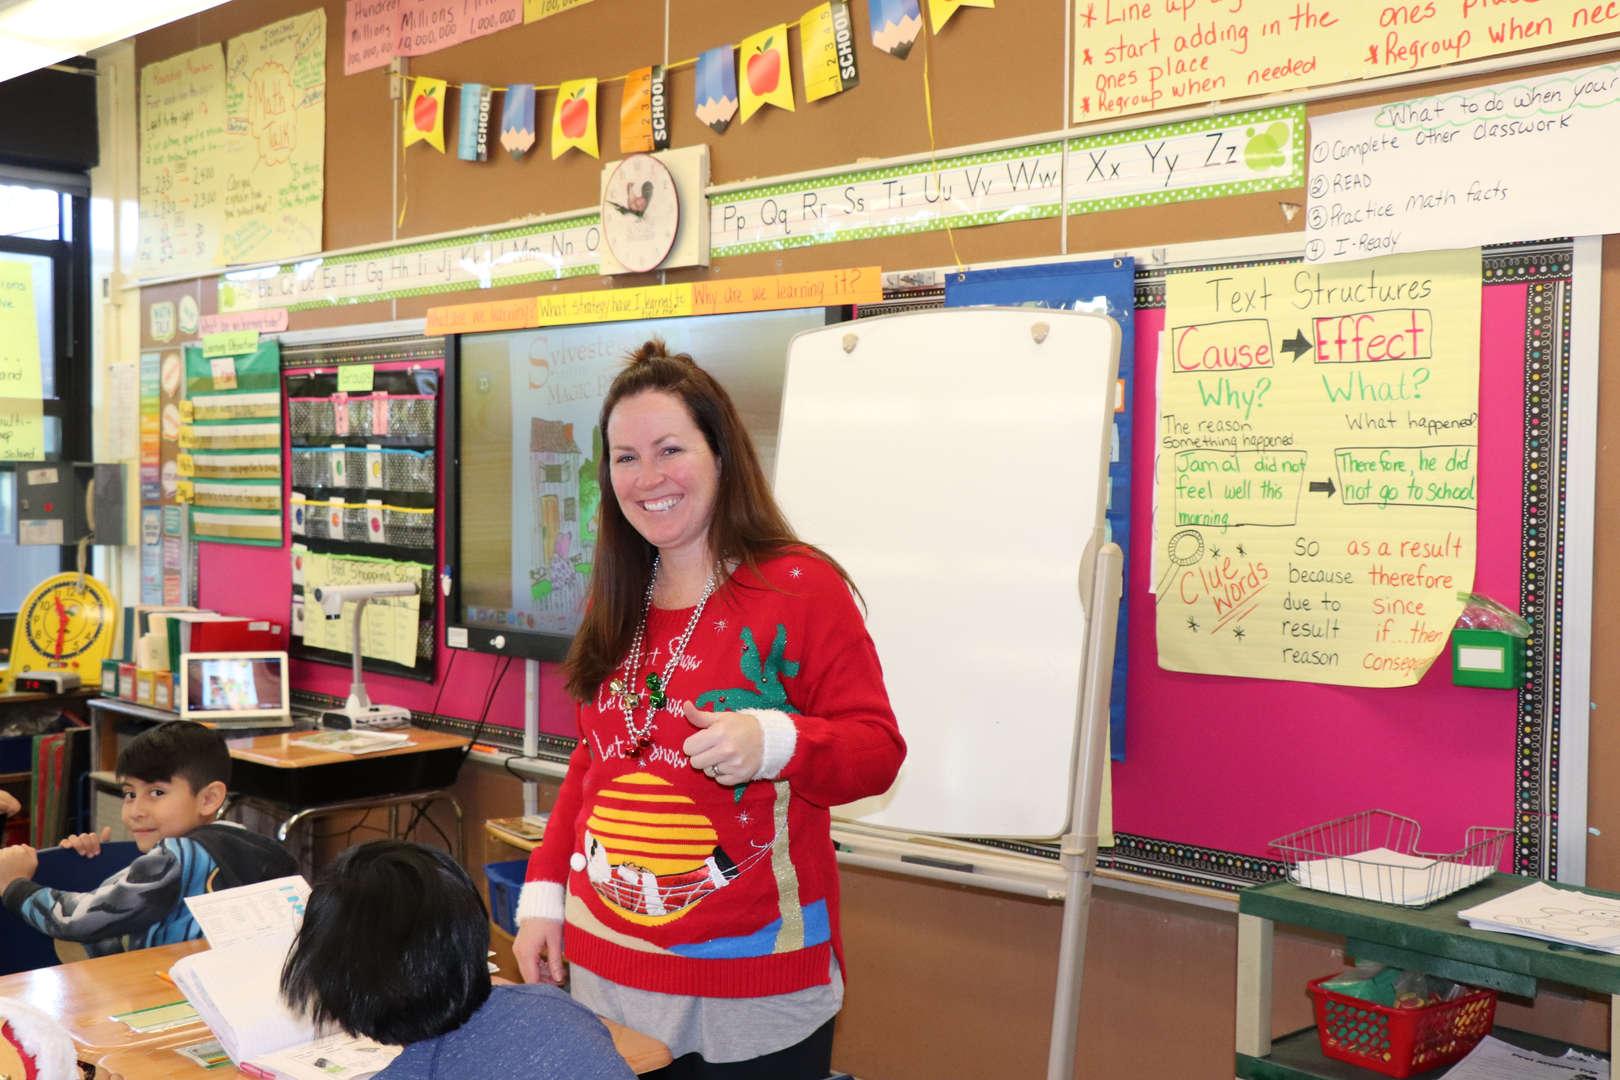 A Fourth Grade Teacher